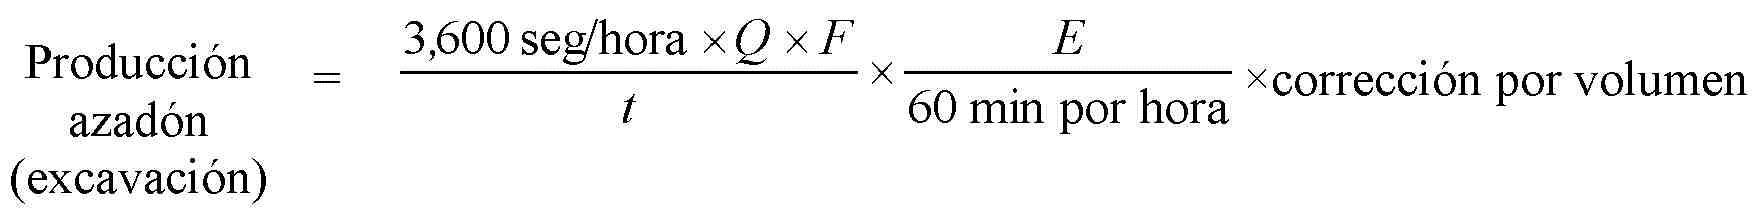 21 ecuacion 8.2